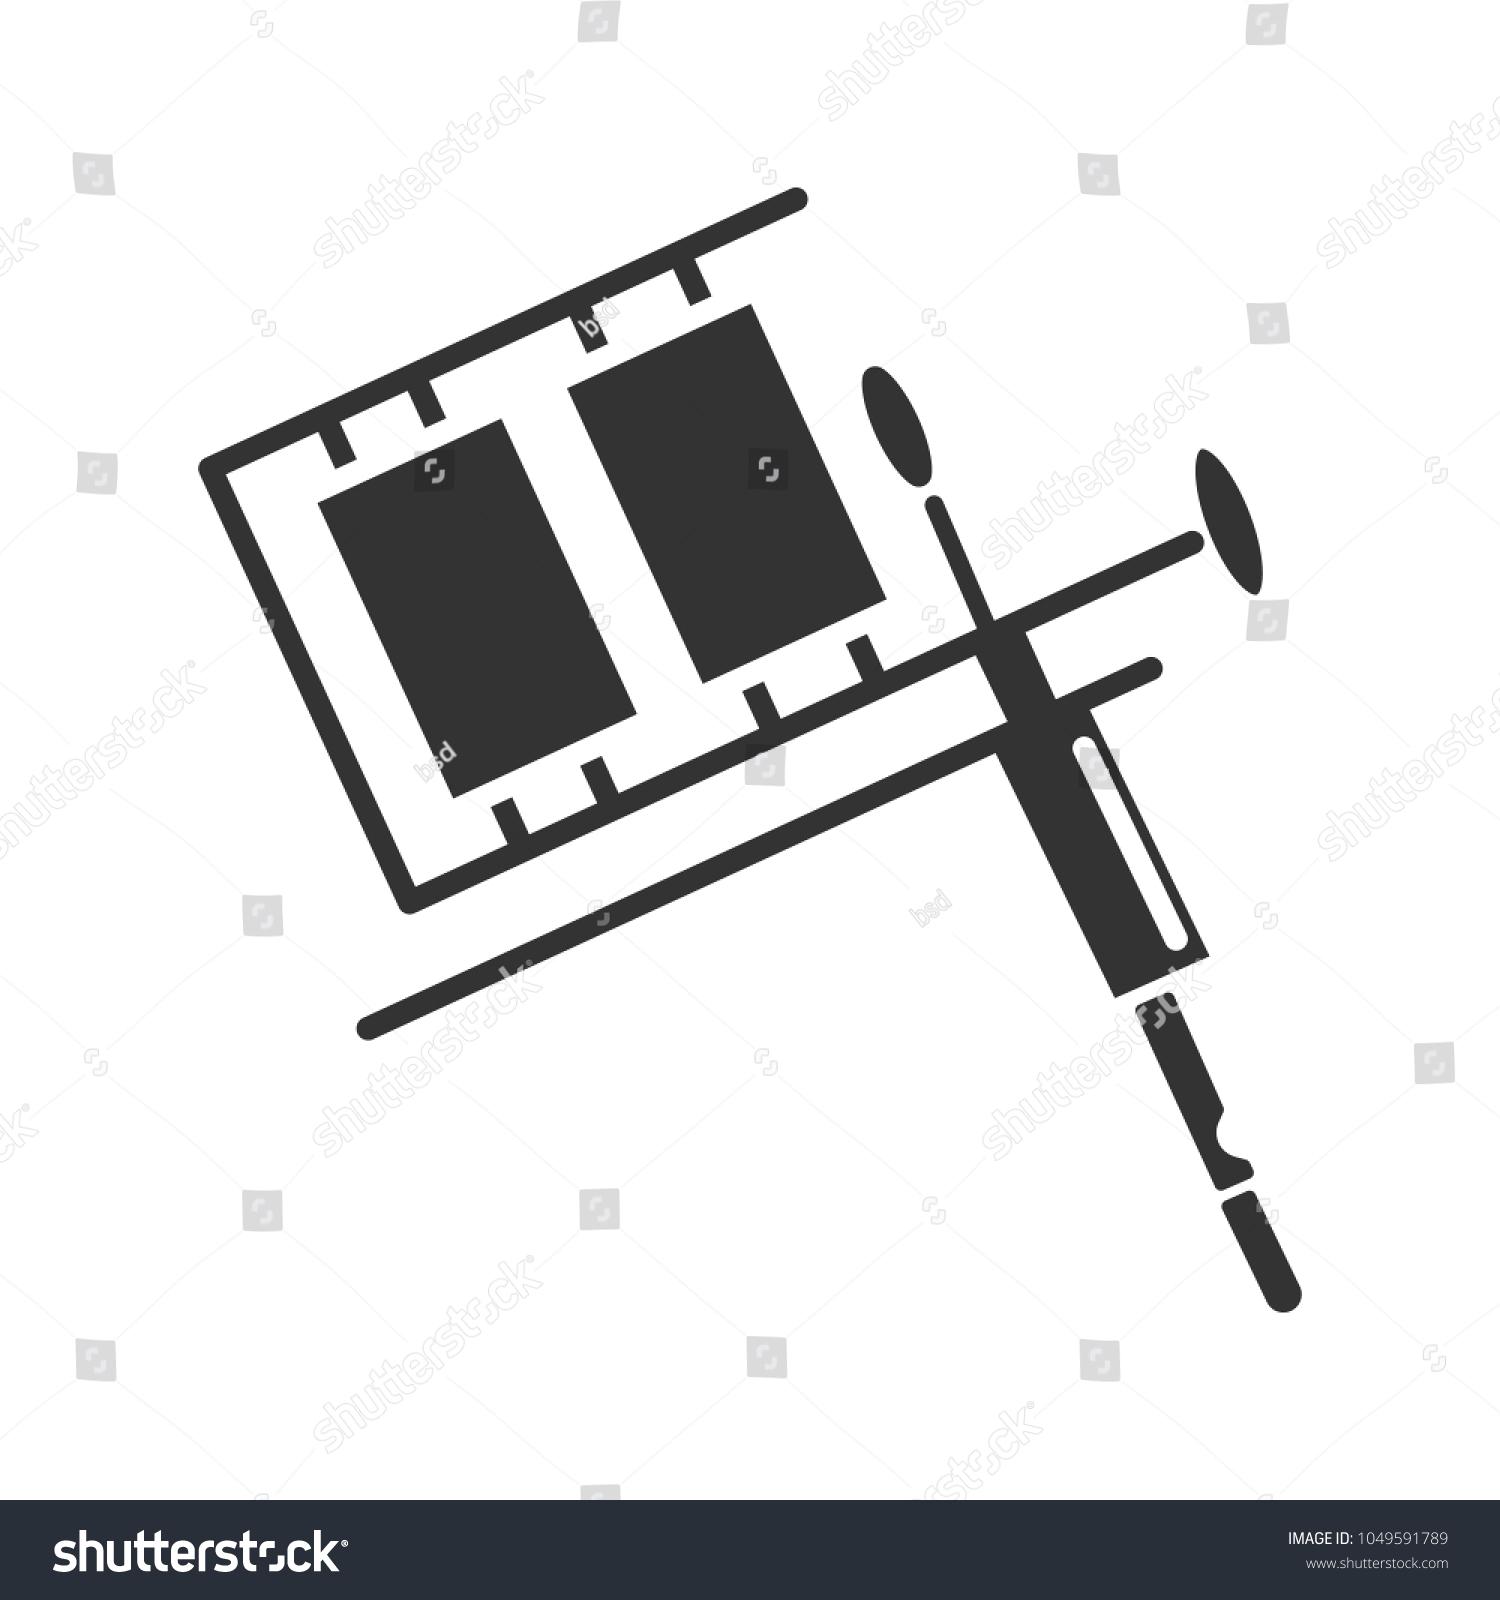 Tattoo Machine Glyph Icon Silhouette Symbol Stock Vector Royalty Diagram Negative Space Gun Isolated